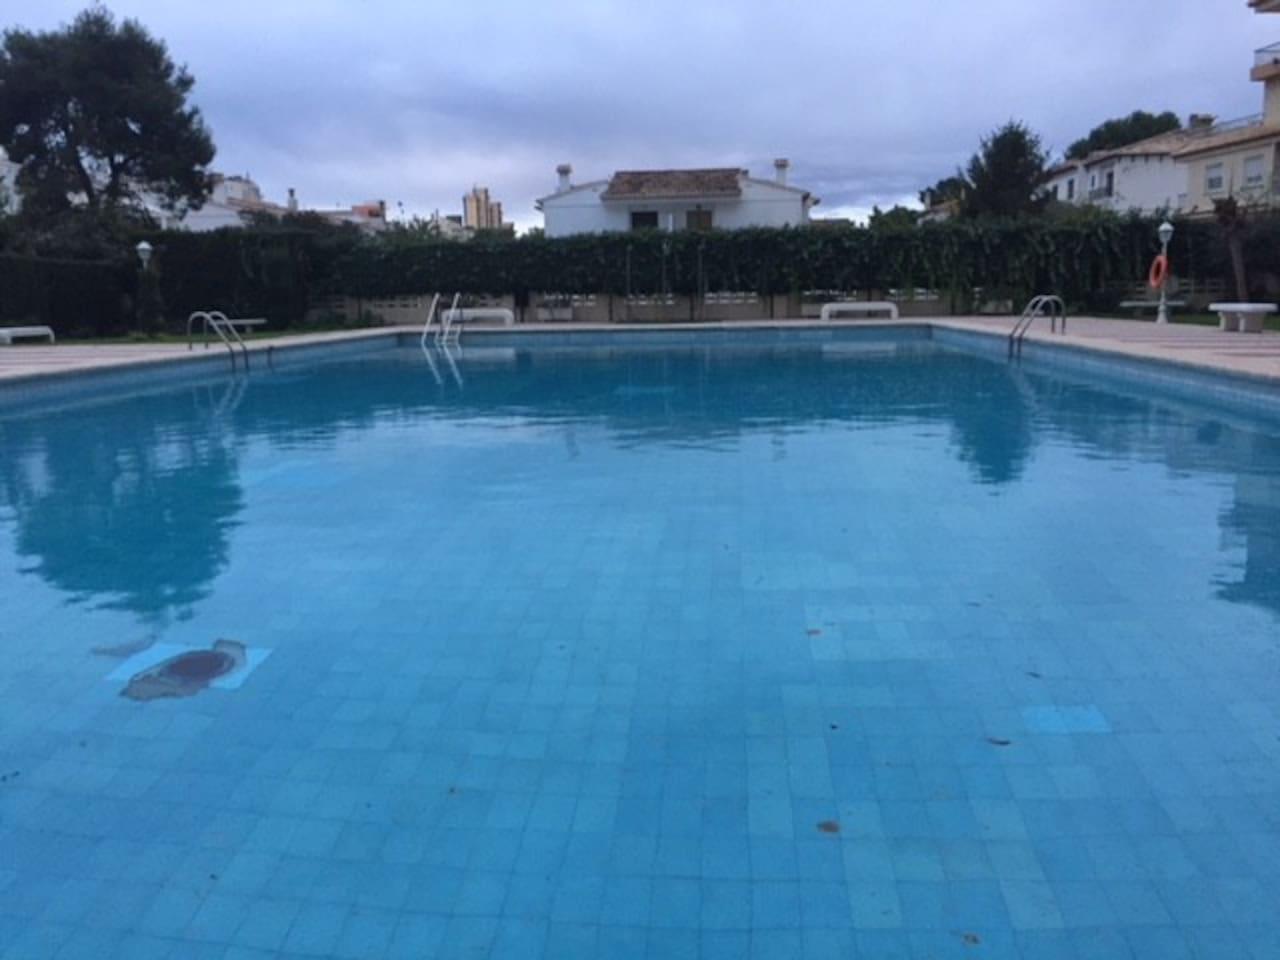 amplia piscina comunitaria